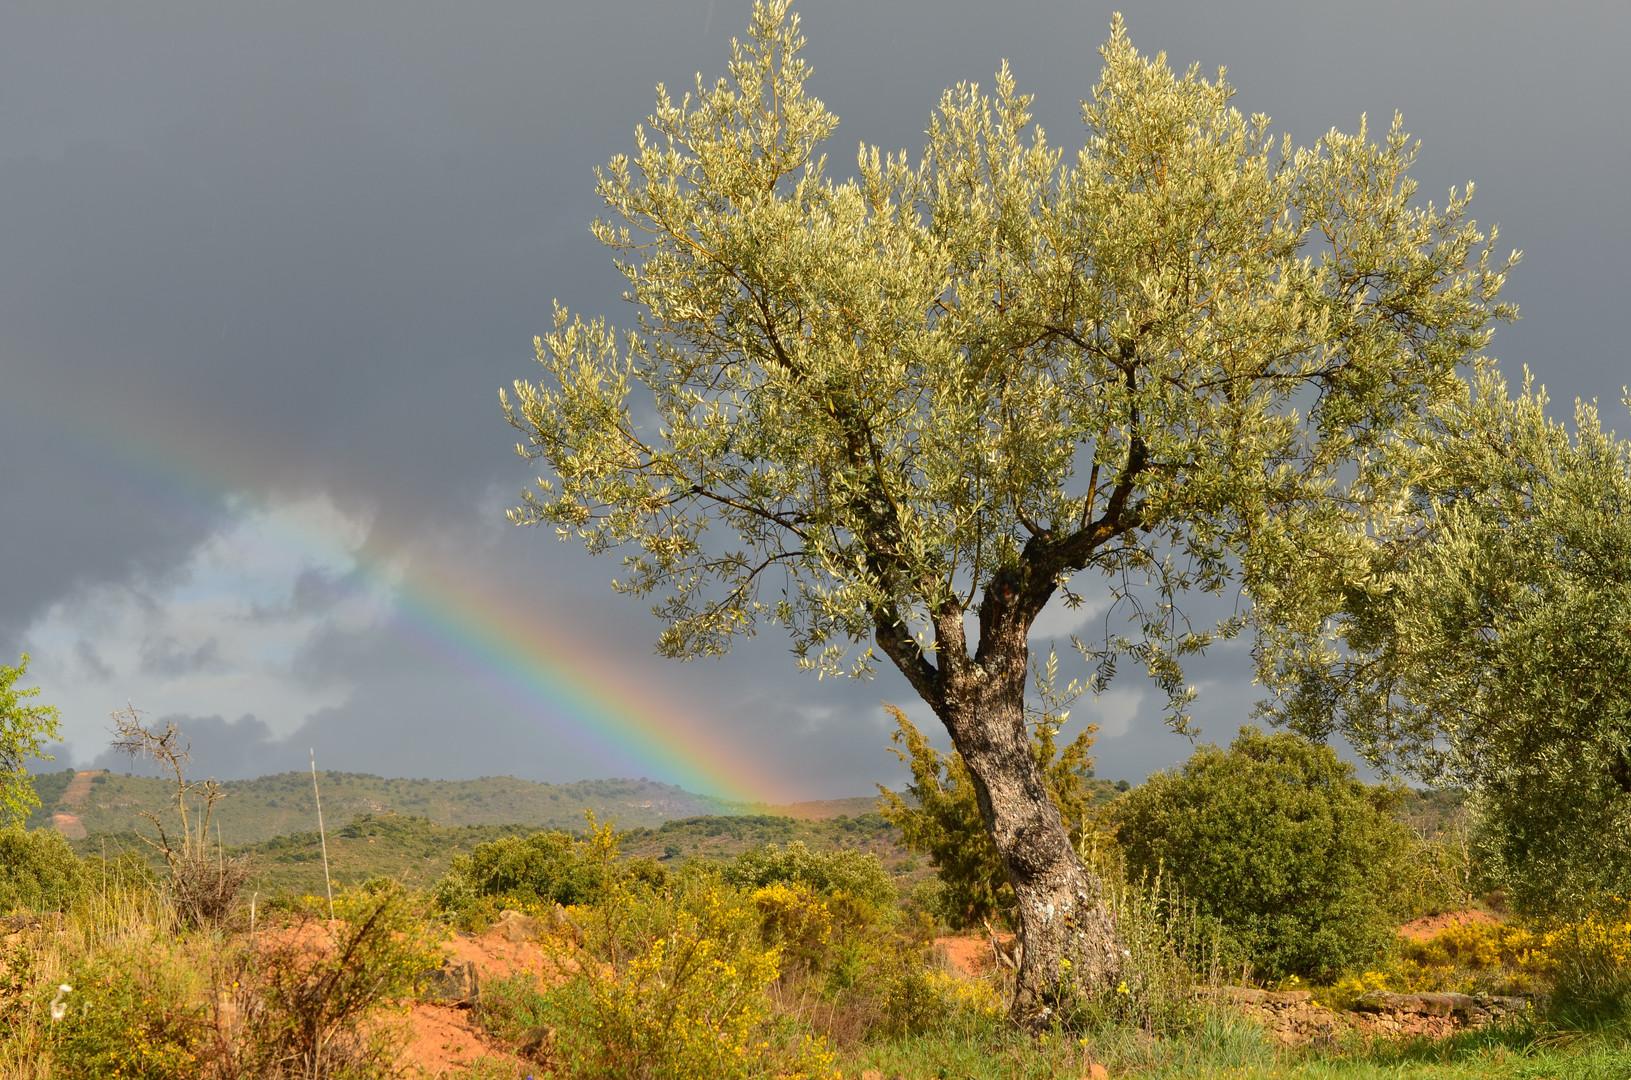 Olivo con arco iris